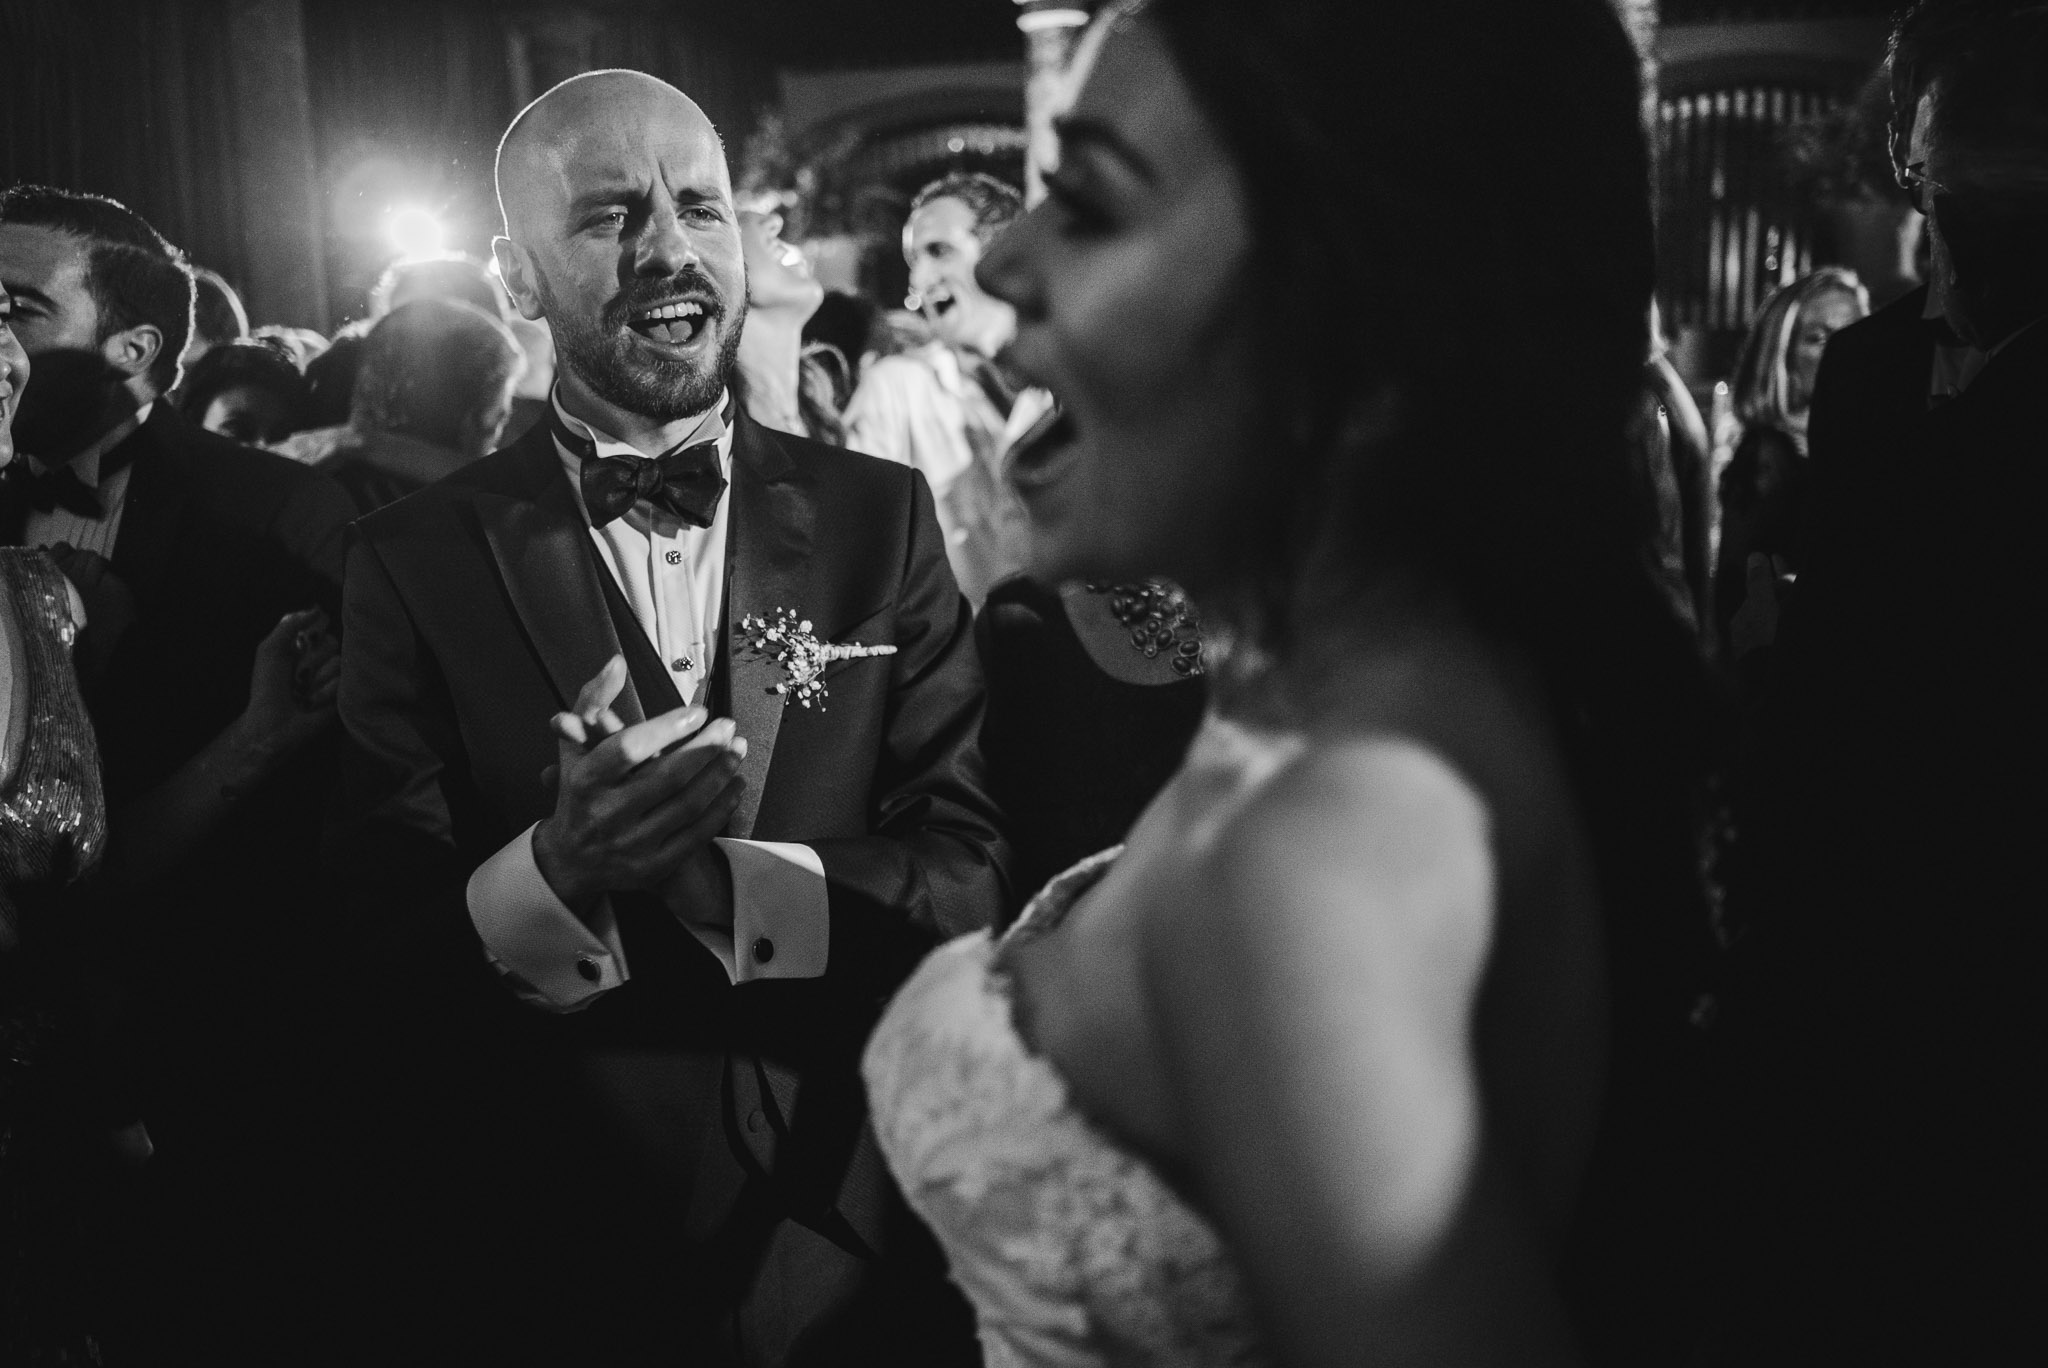 ©www.mauriziosolisbroca.com-20161002maurizio-solis-broca-mexico-canada-wedding-photographer20161002DSC08601-Edit.jpg